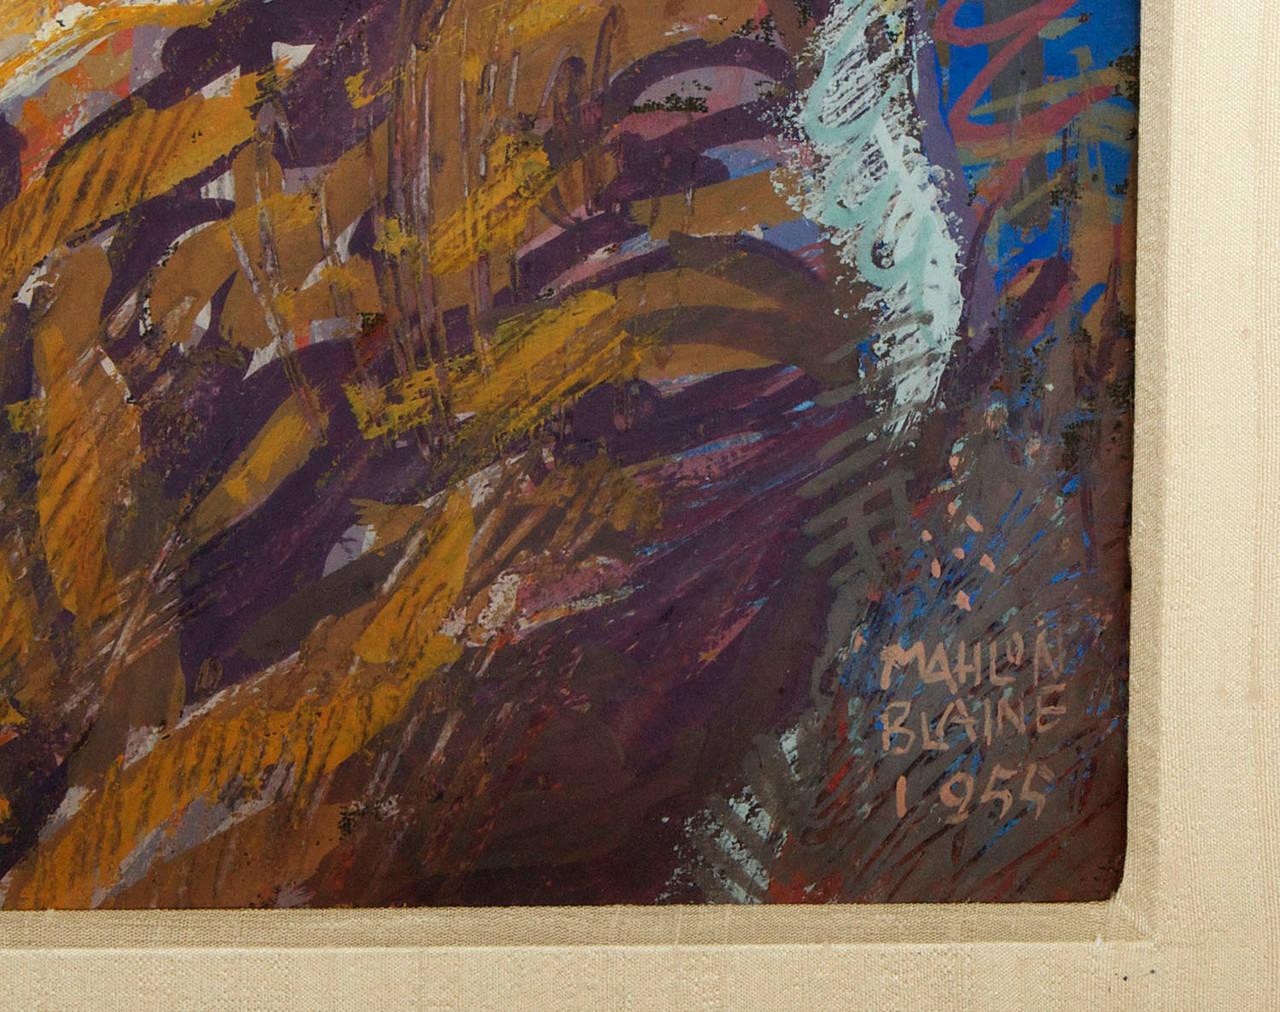 Forging Ahead - American Modern Painting by Mahlon Blaine